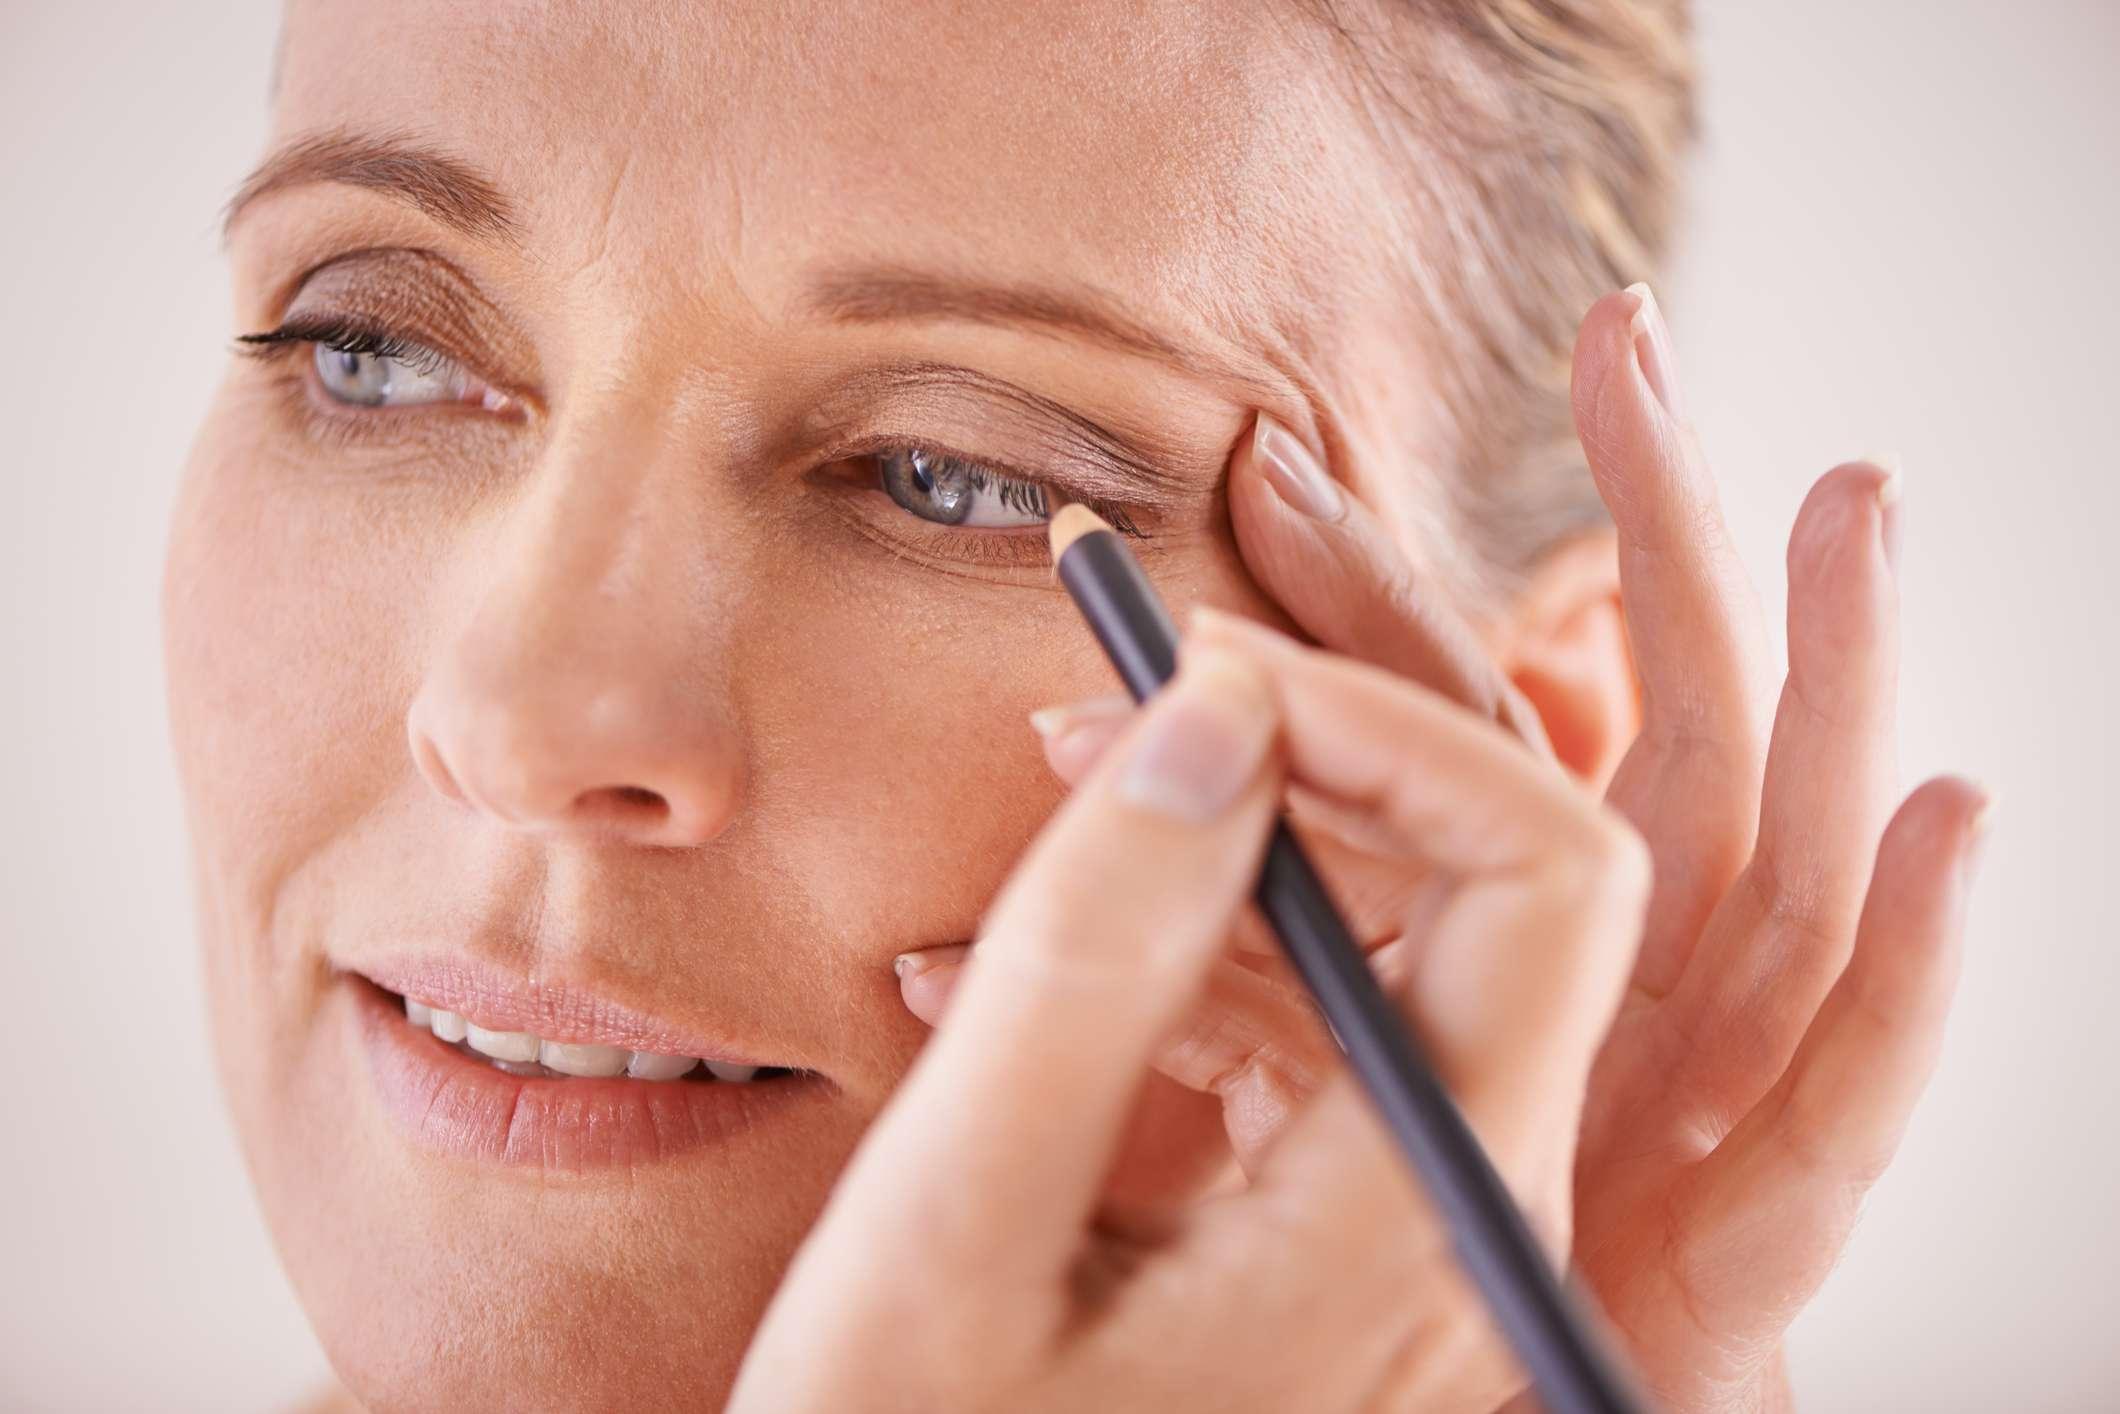 25 Makeup Tips To Look Beautiful Over 50